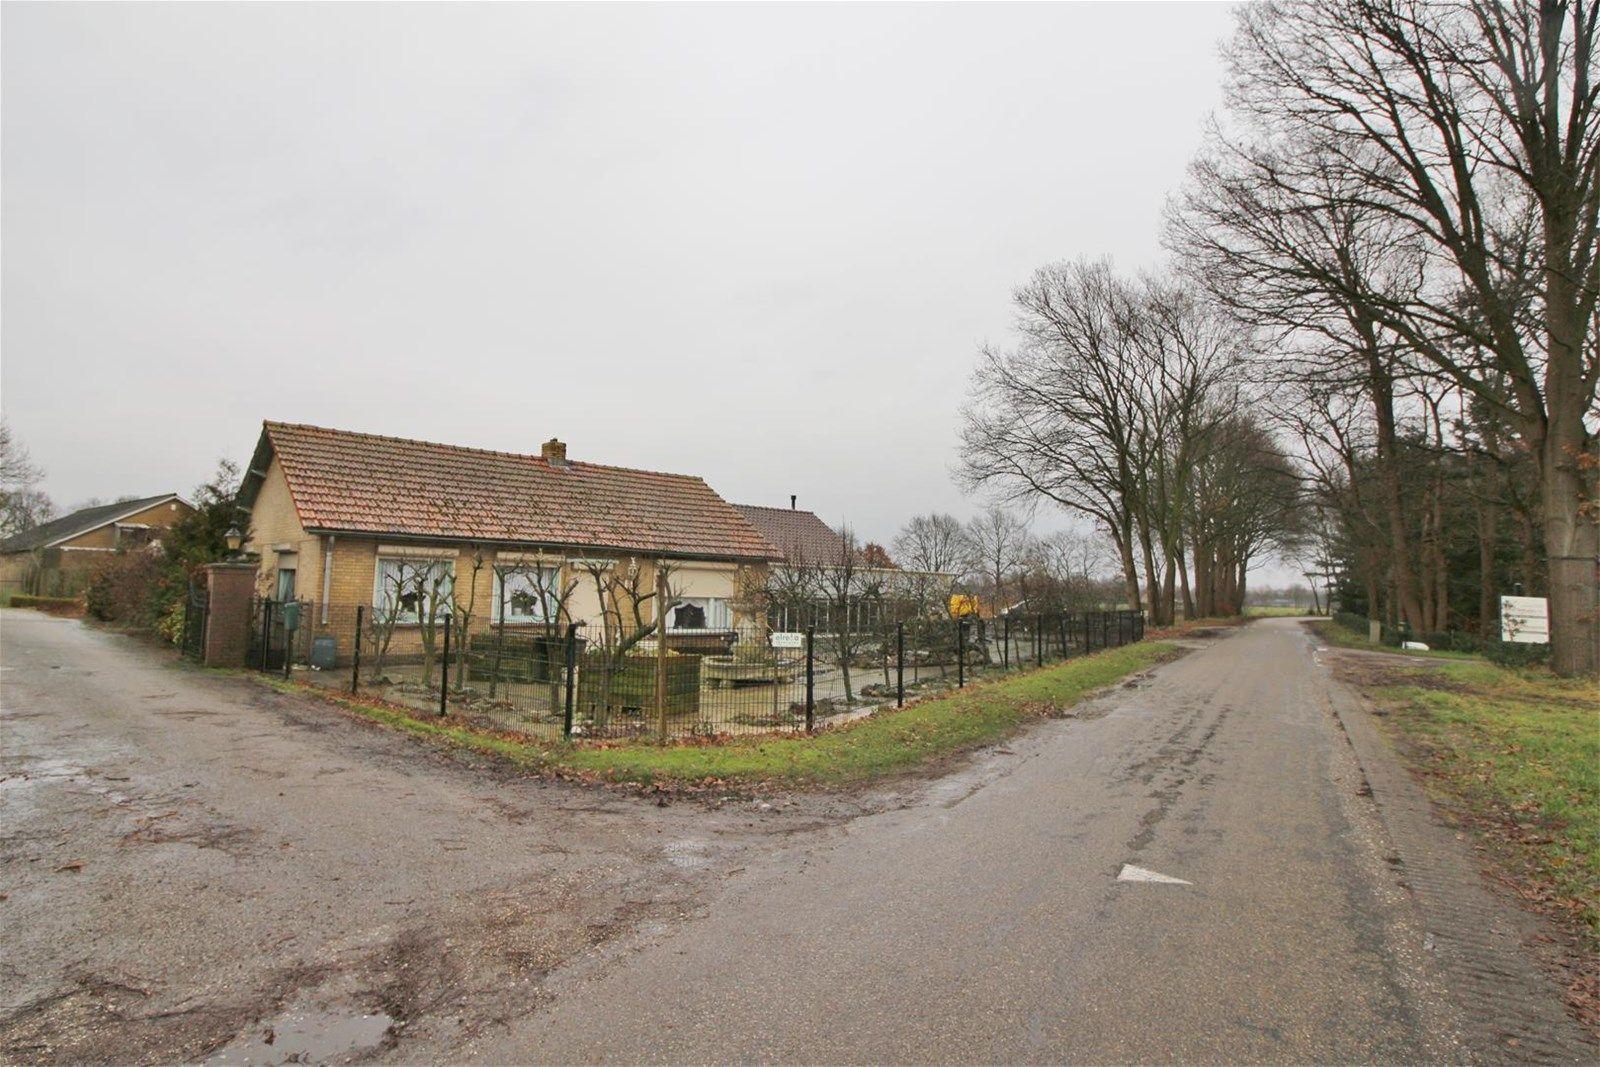 Vosbergstraat 21, Heesch